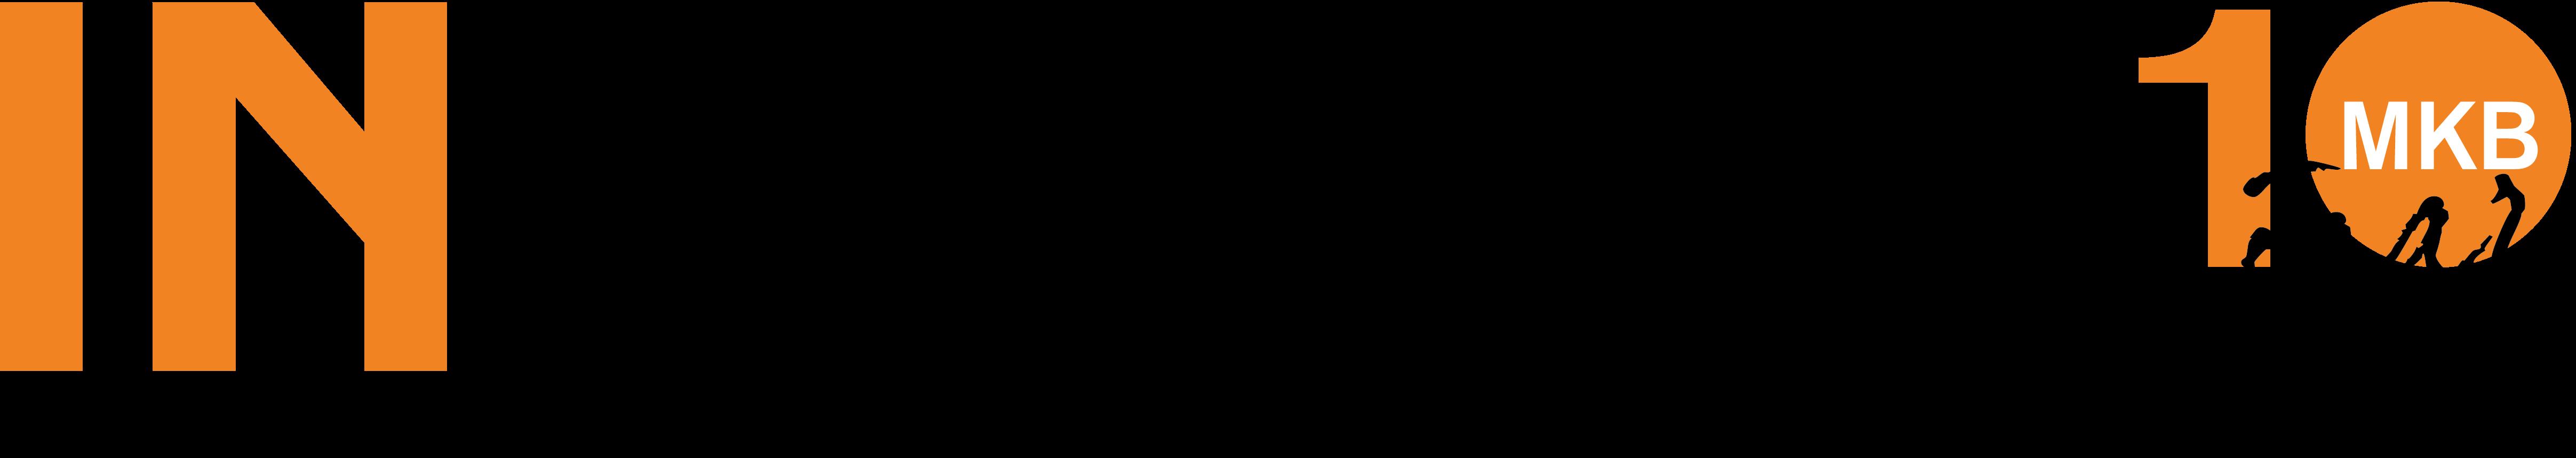 Logo InkoperMKB 10 jaar